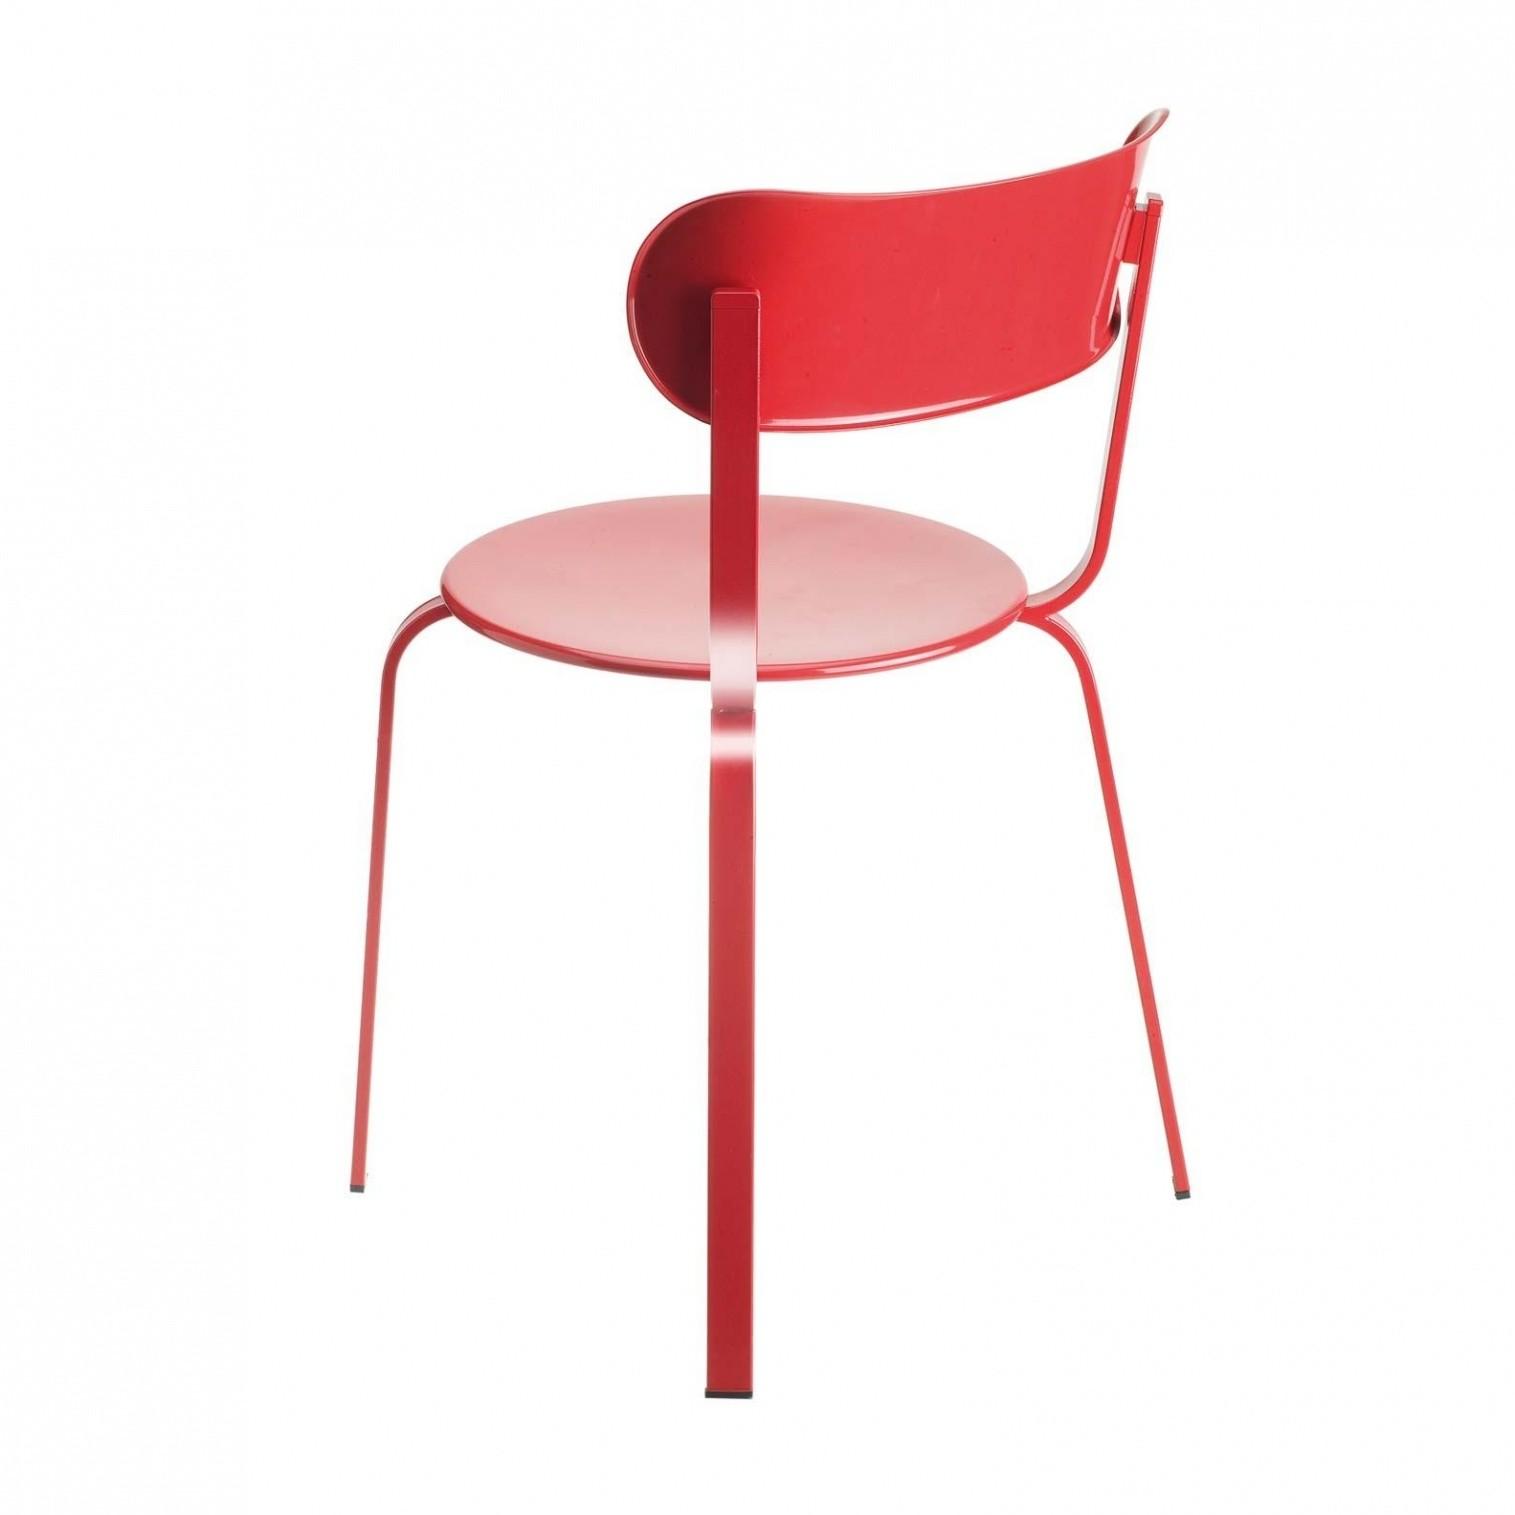 Miraculous Stil Chair Andrewgaddart Wooden Chair Designs For Living Room Andrewgaddartcom